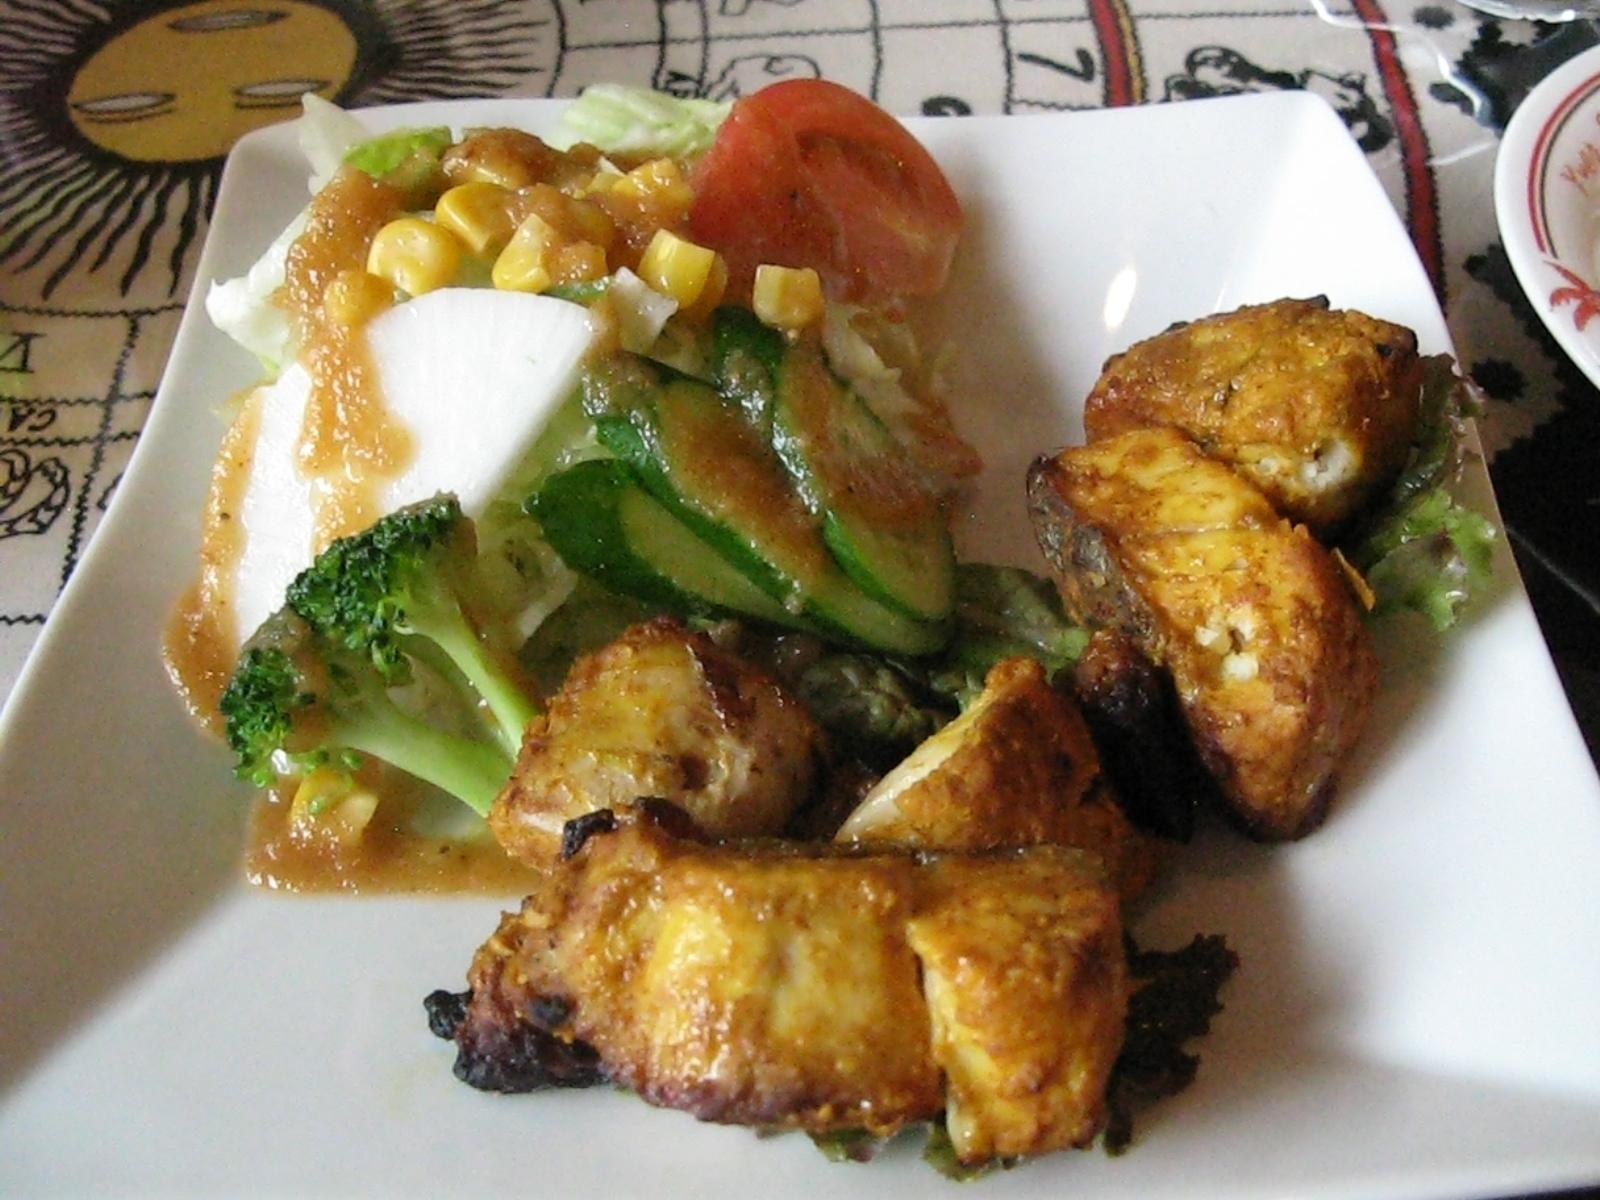 Indian Snacks - Chaat | Plated Food | Food & Drink | Pixoto